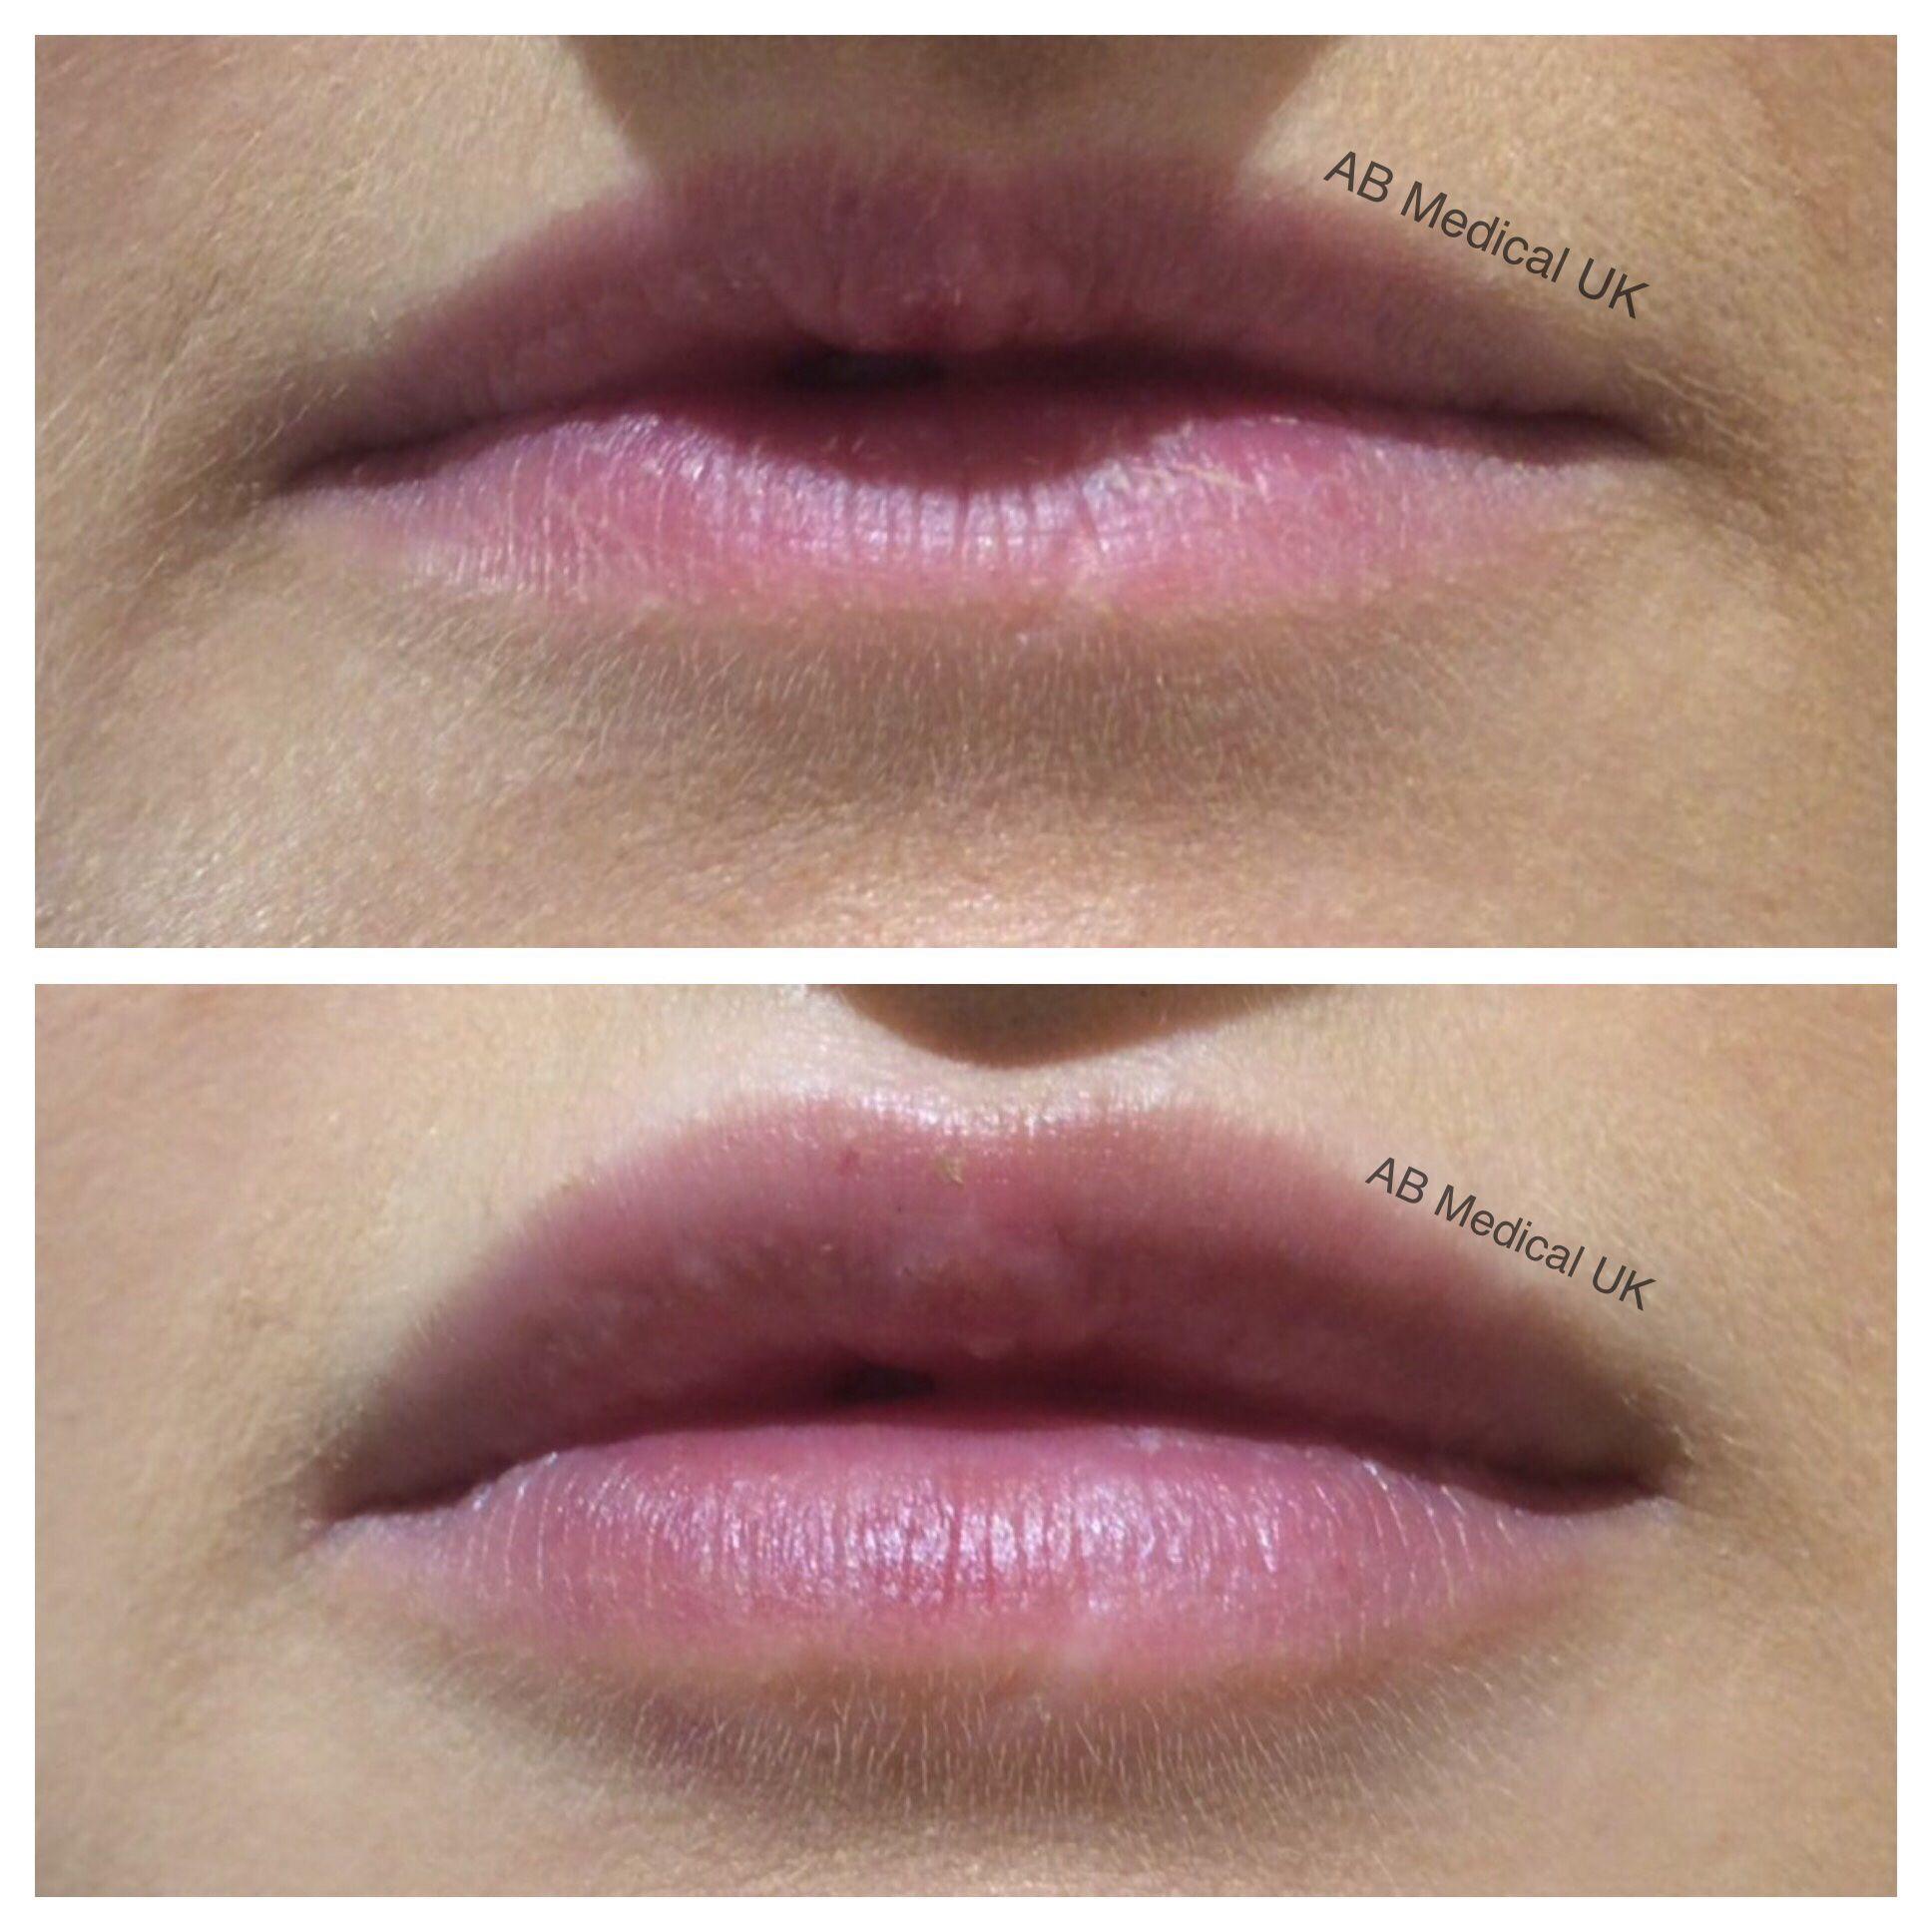 Juvederm ultra smile at AB Medical UK | Lips | Lip